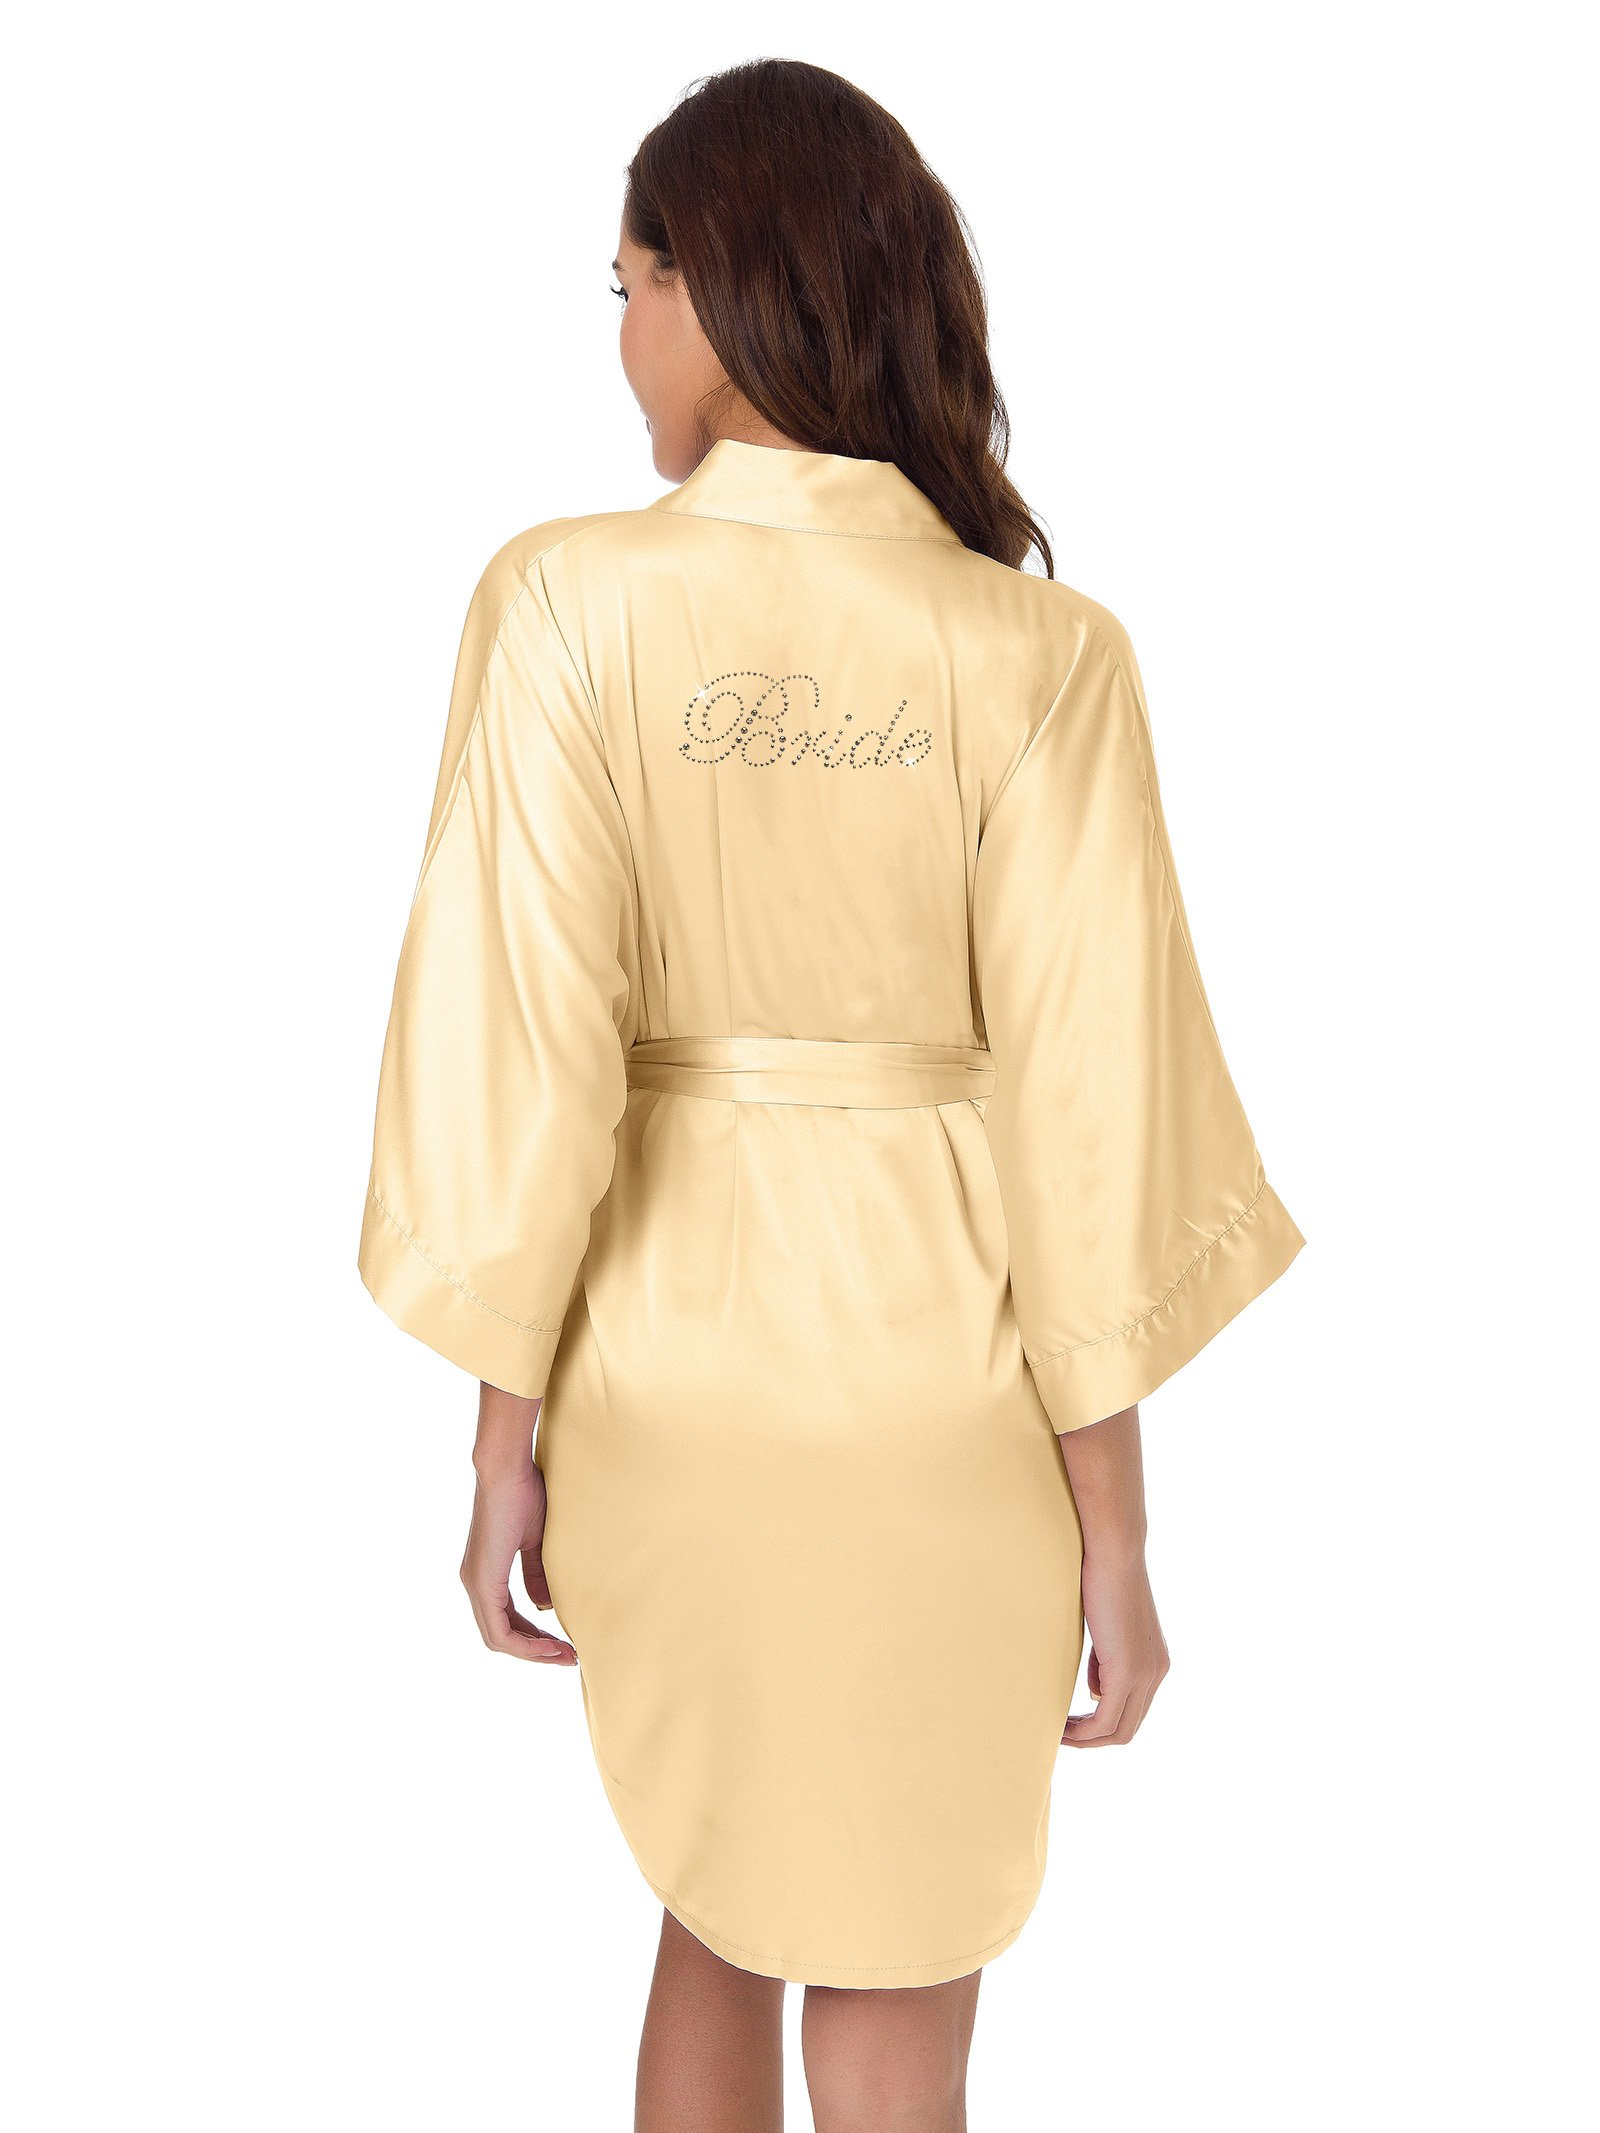 SIORO Robe, Womens Robe, Soft Satin Robe Short, Bride Wedding Party Nightgown, Sleepwear Solid, Champagne, S